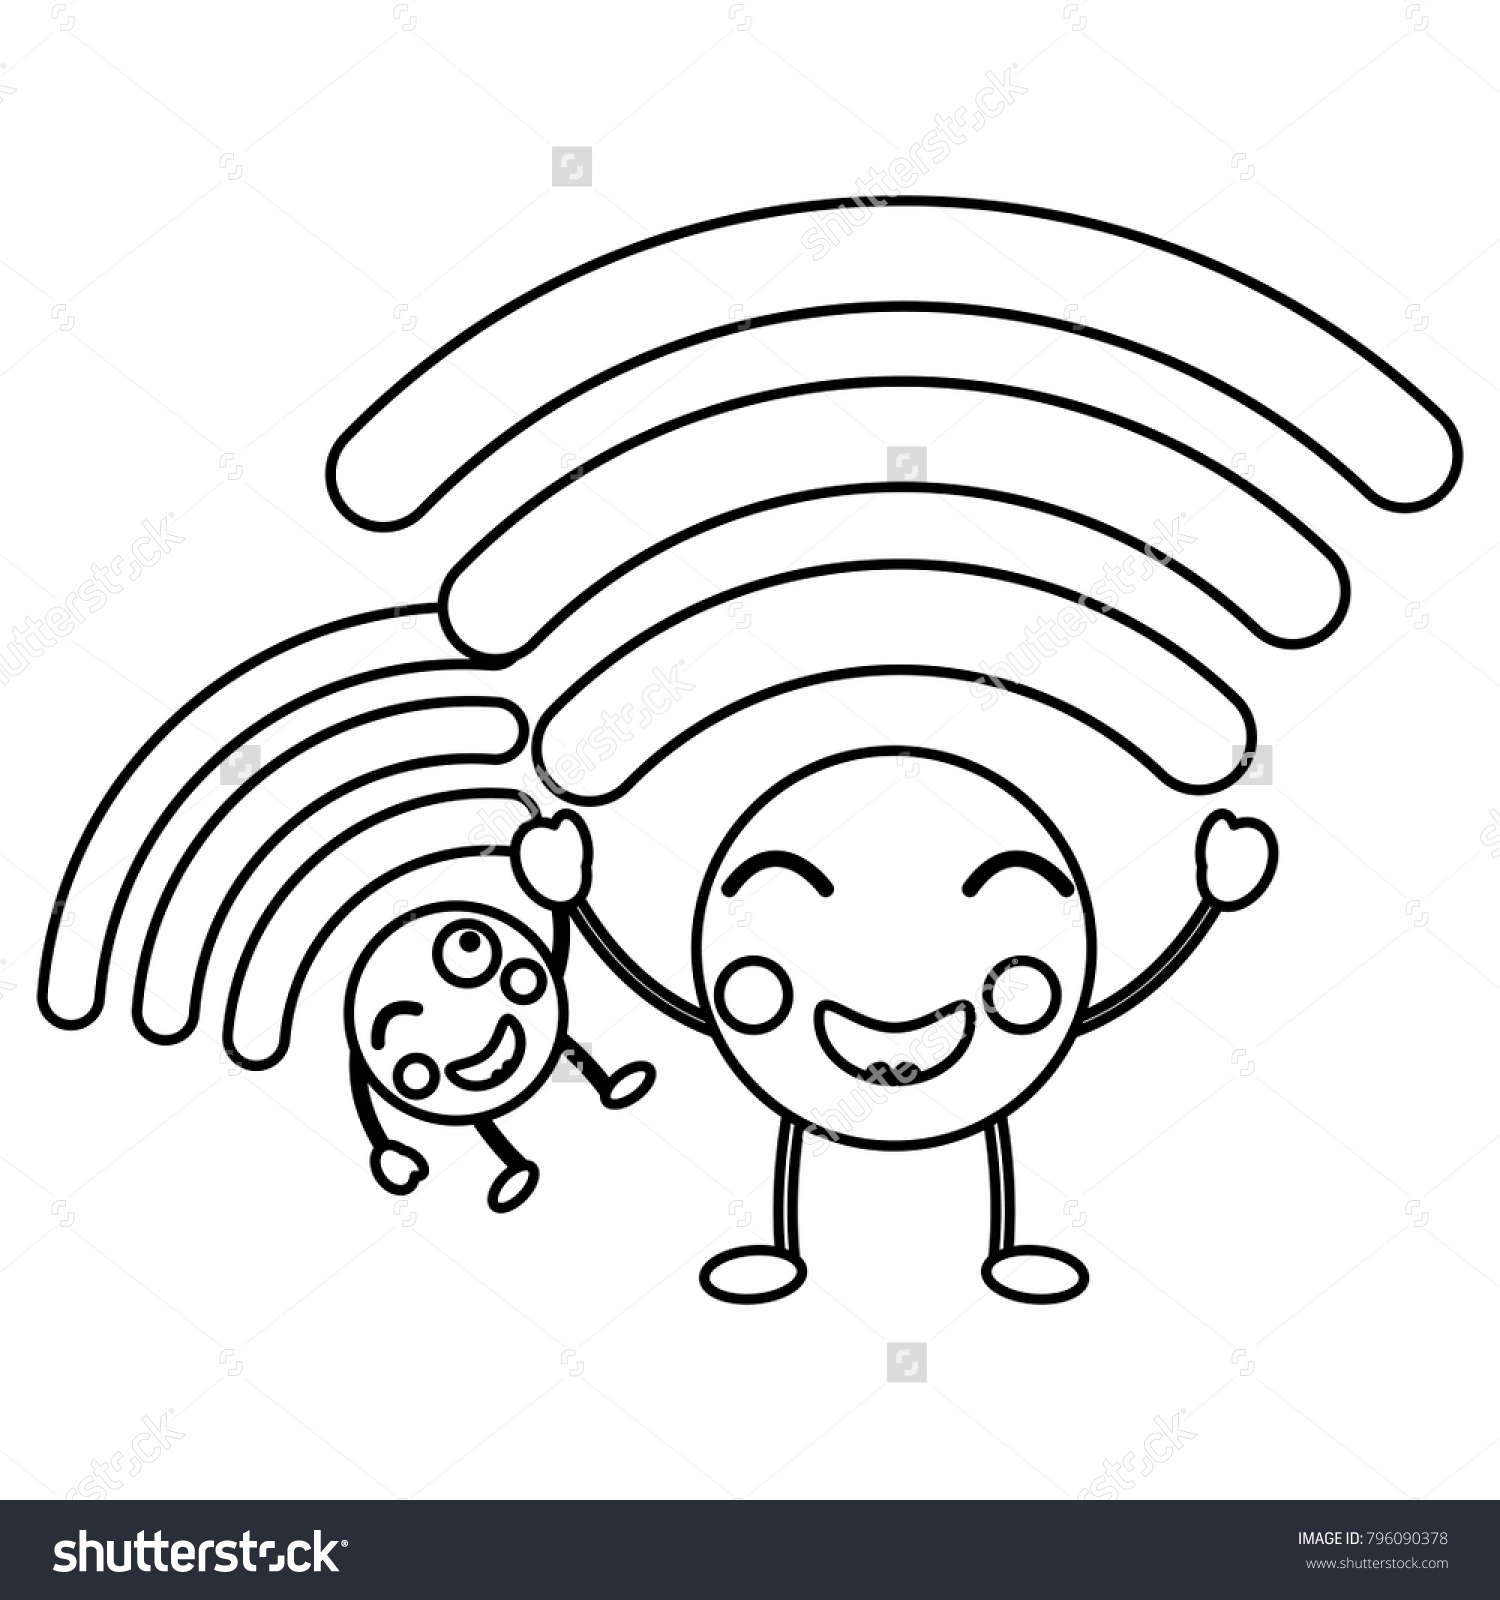 cartoon wifi internet signal kawaii character stock vector royalty Wireless Router cartoon wifi internet signal kawaii character